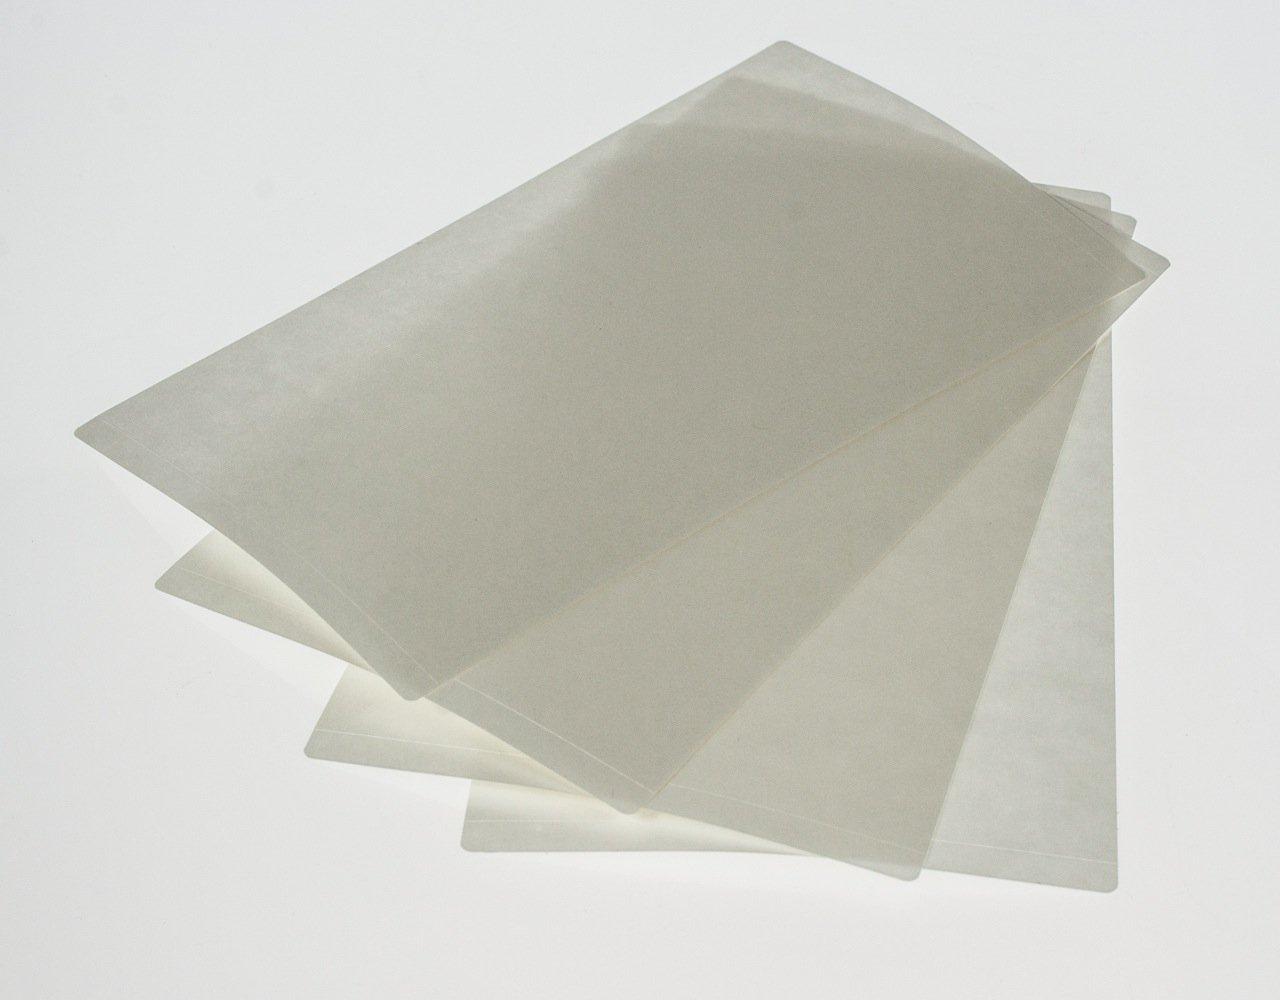 UltraCruz PCR Clear Adhesive Plate Seals, 100/case